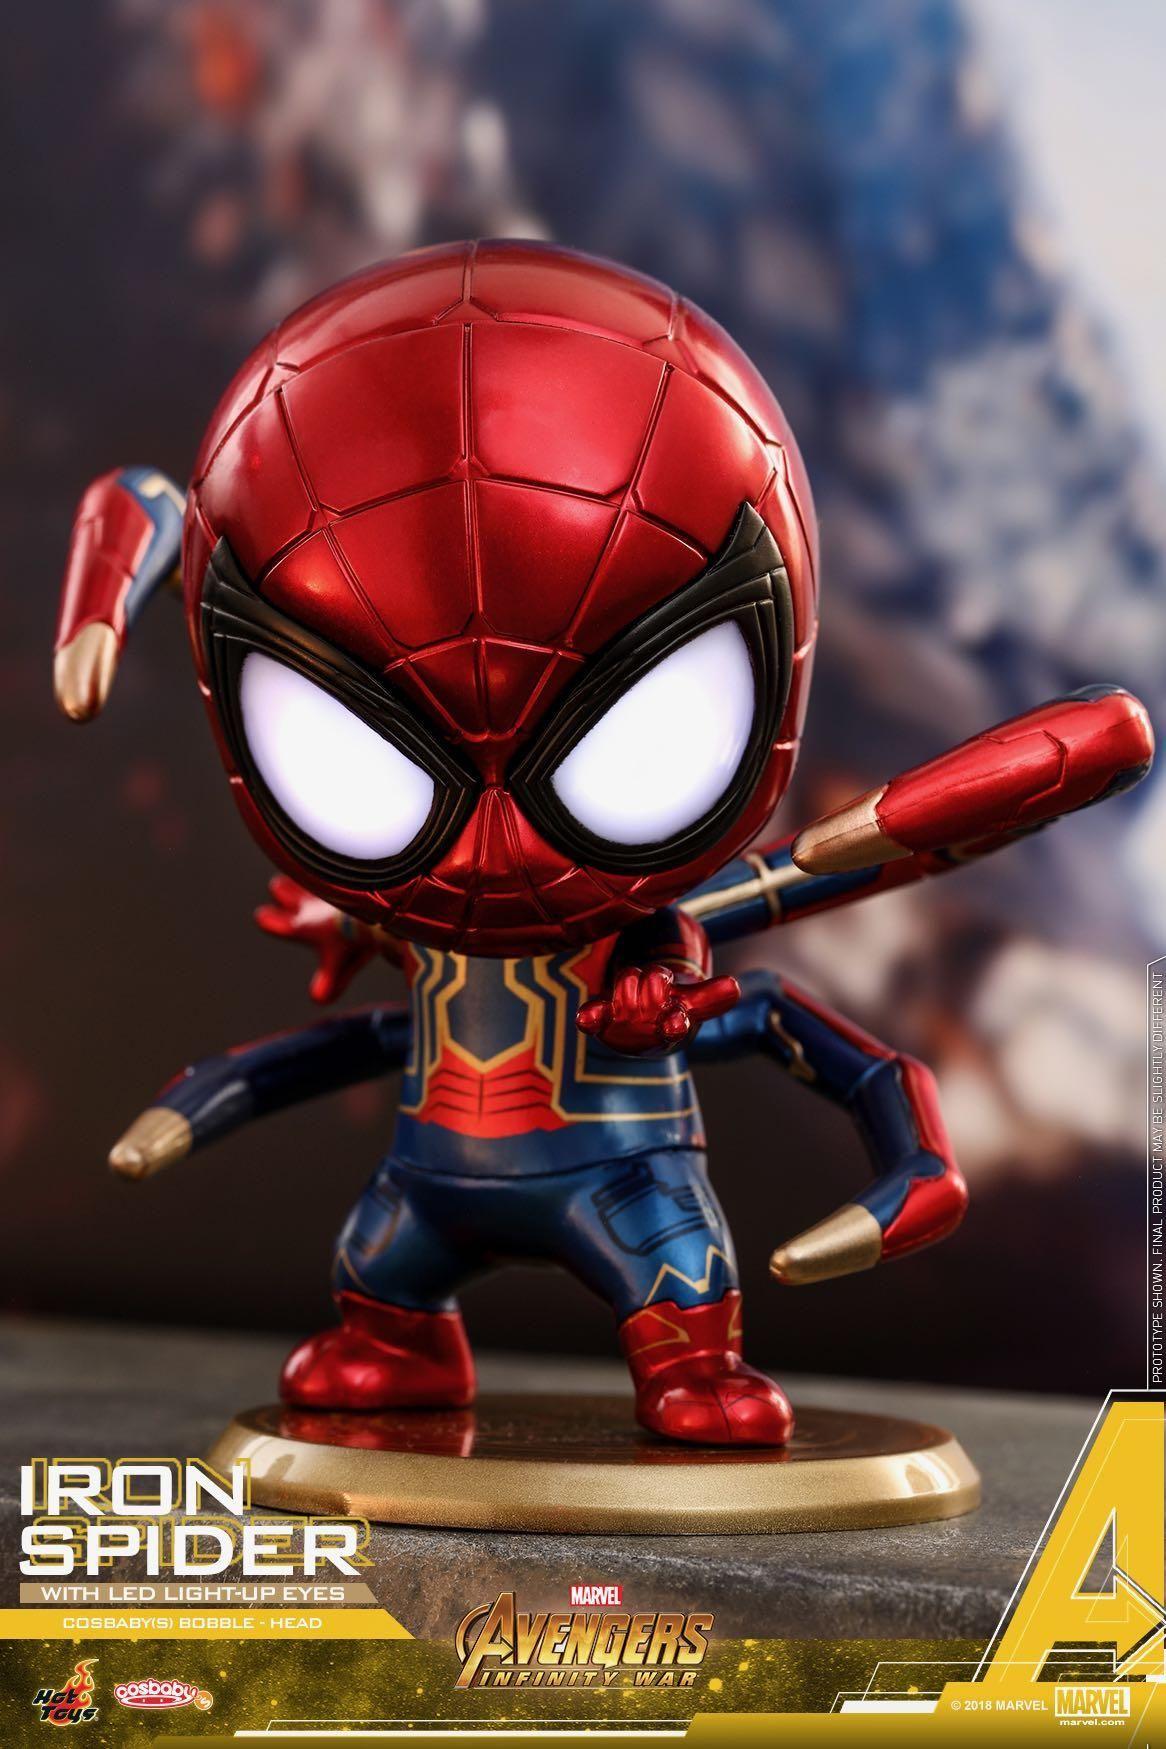 HOT Marvel Spider-Man Upside Down Spiderman Bobble Head action Figure Present